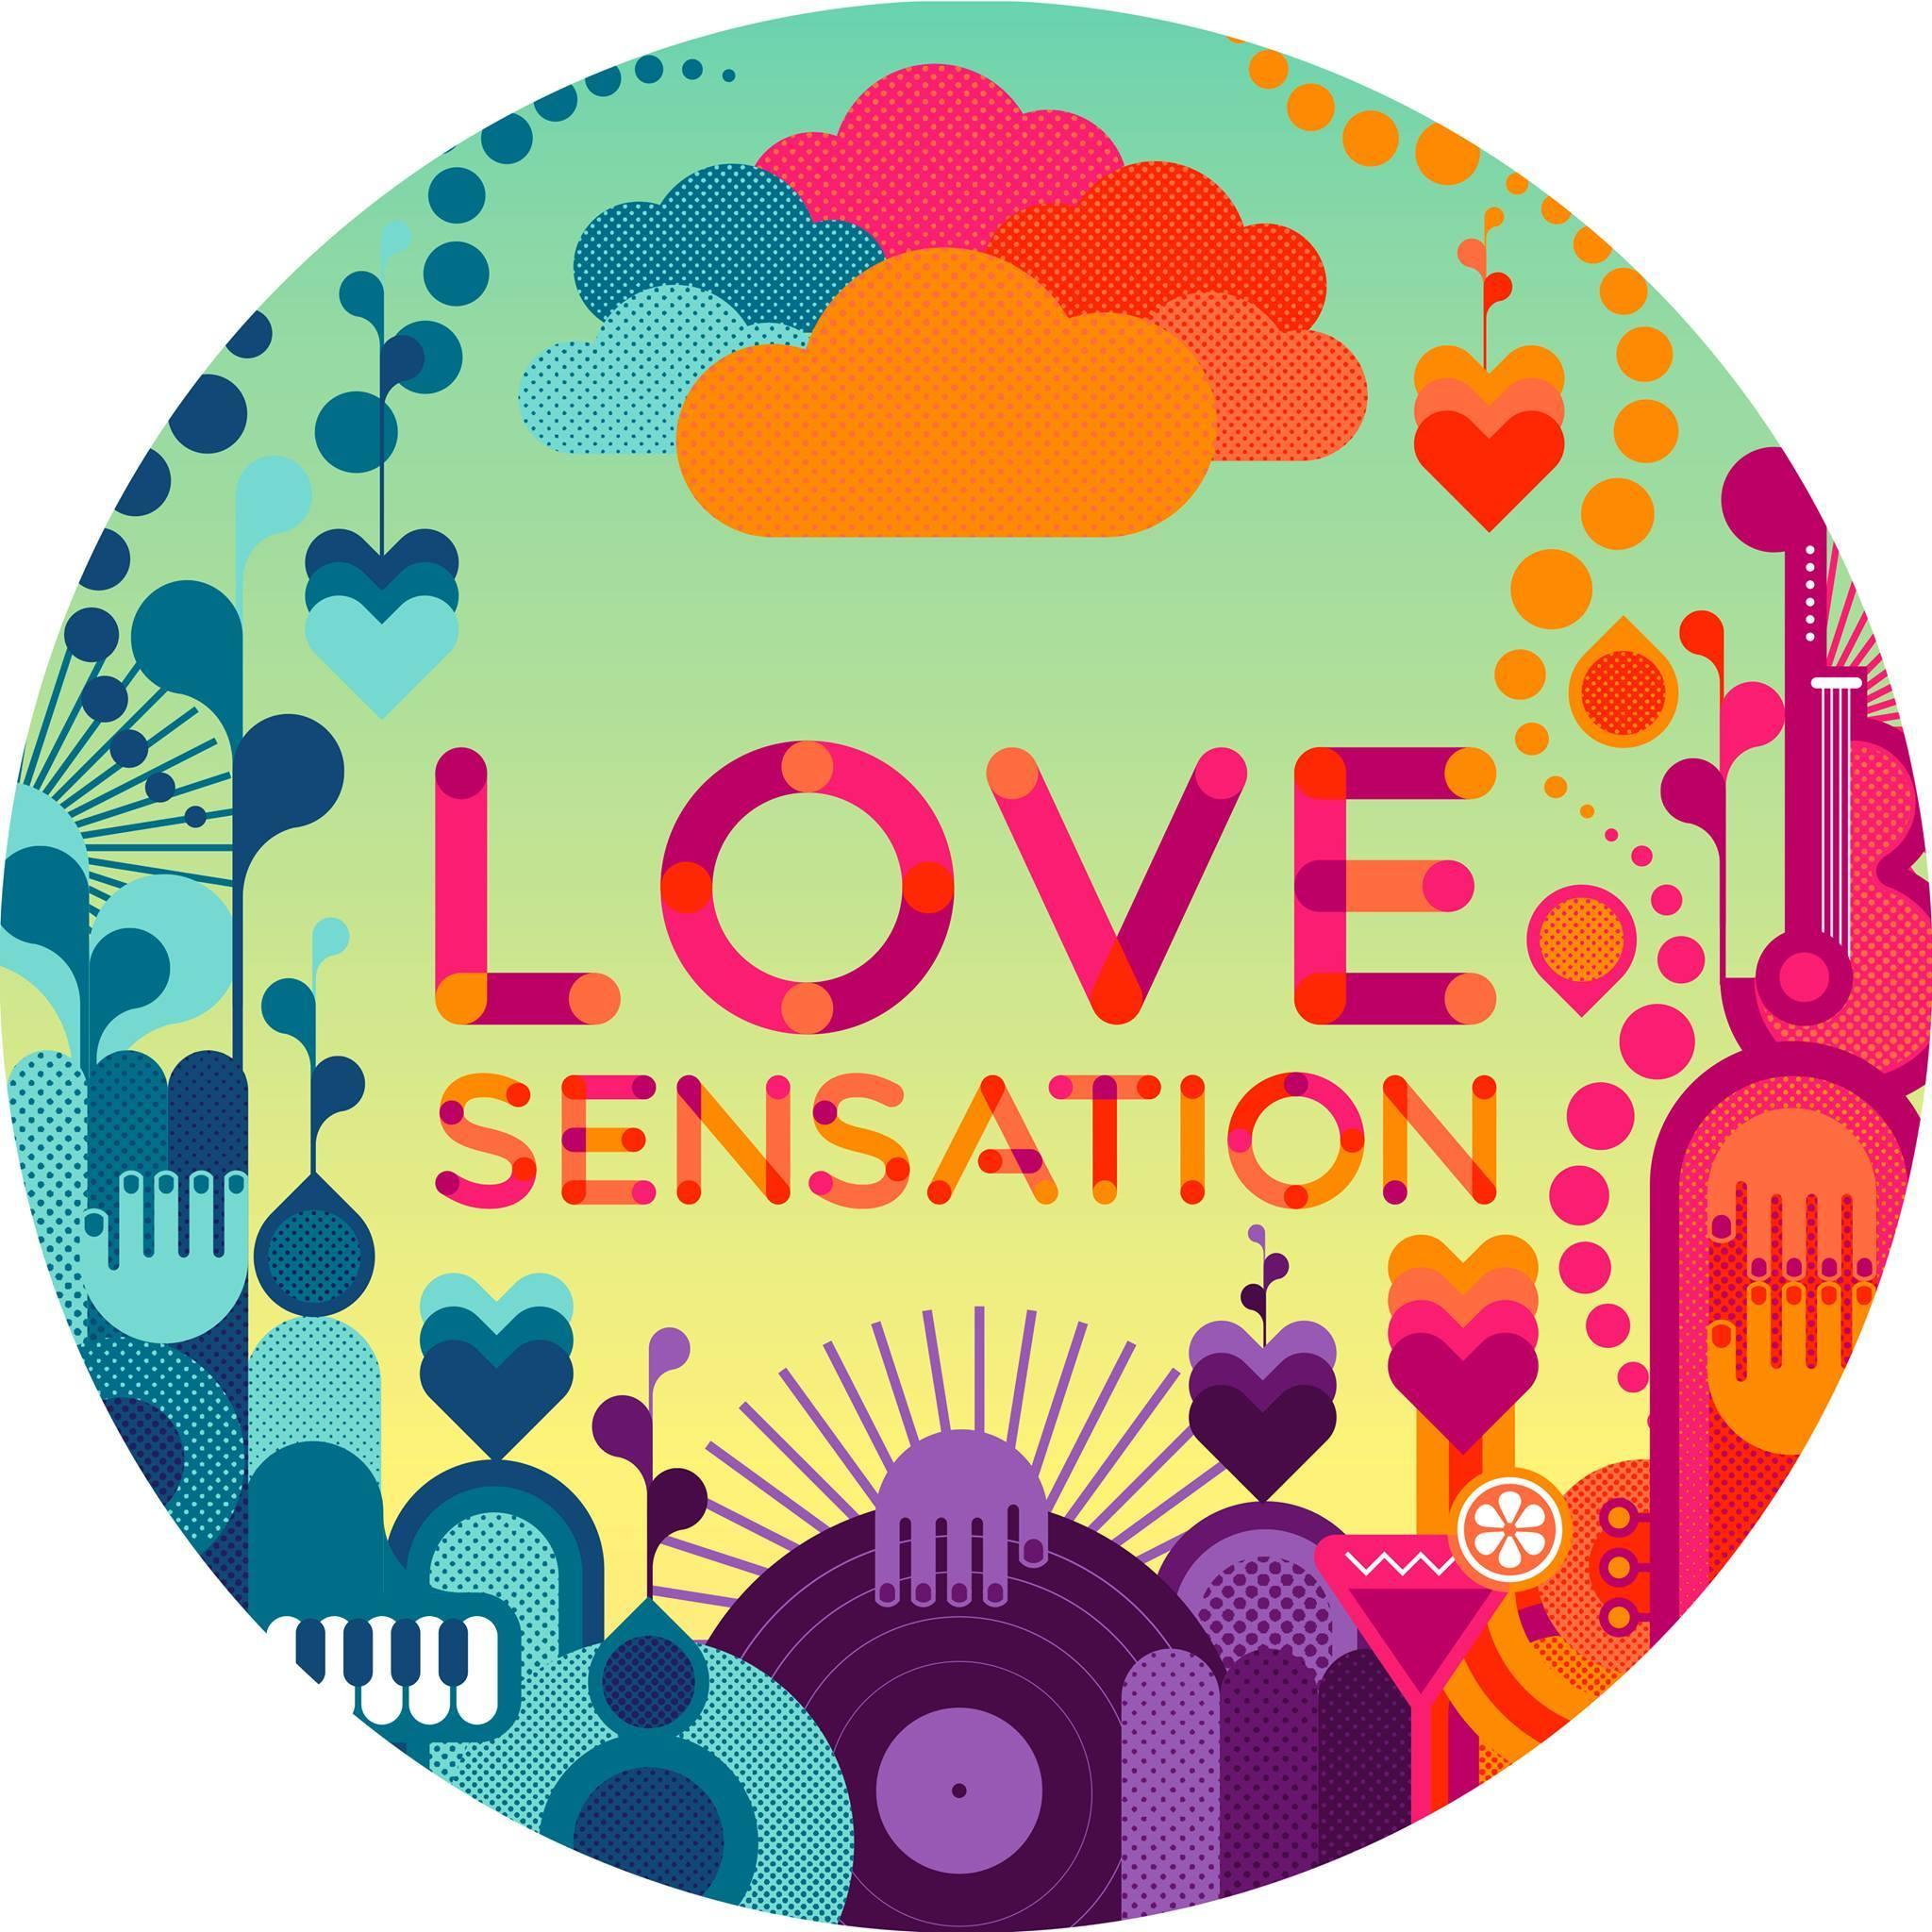 Love Sensation - Music Festivals in Ireland 2020